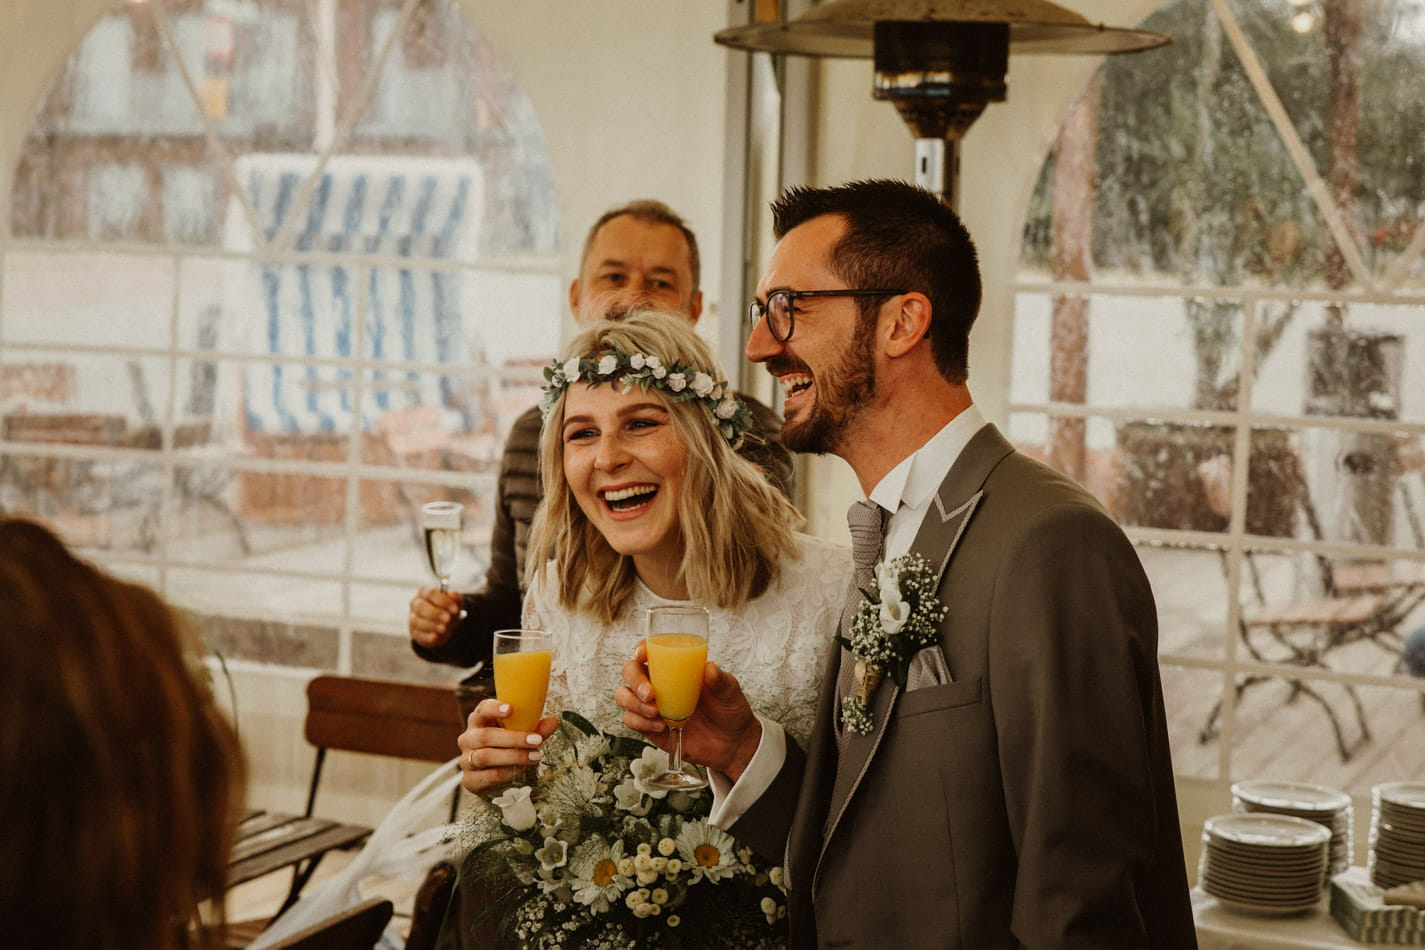 Hochzeit-am-Tatort-Hawaii